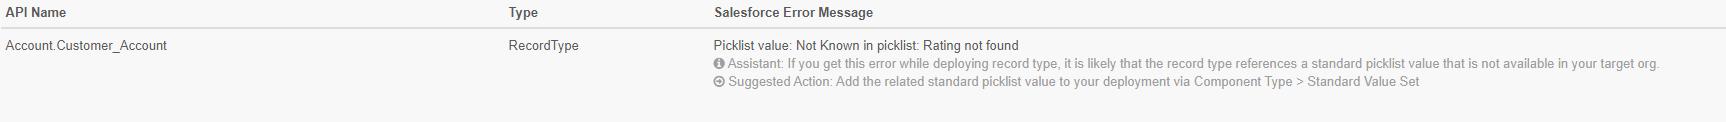 Error_MissingPicklist_value.png